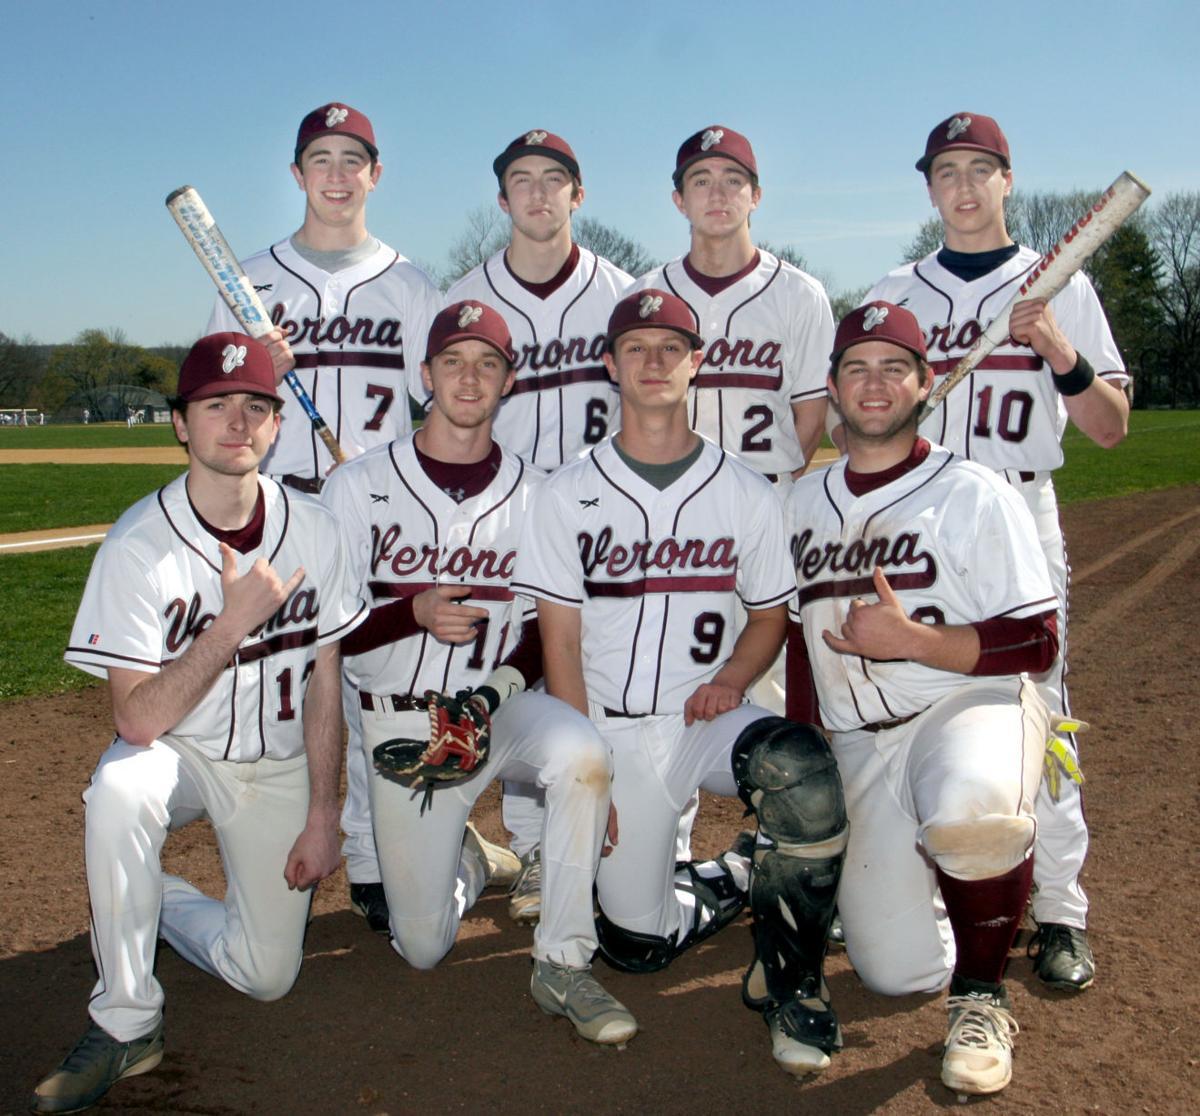 Verona Hillbilly baseball